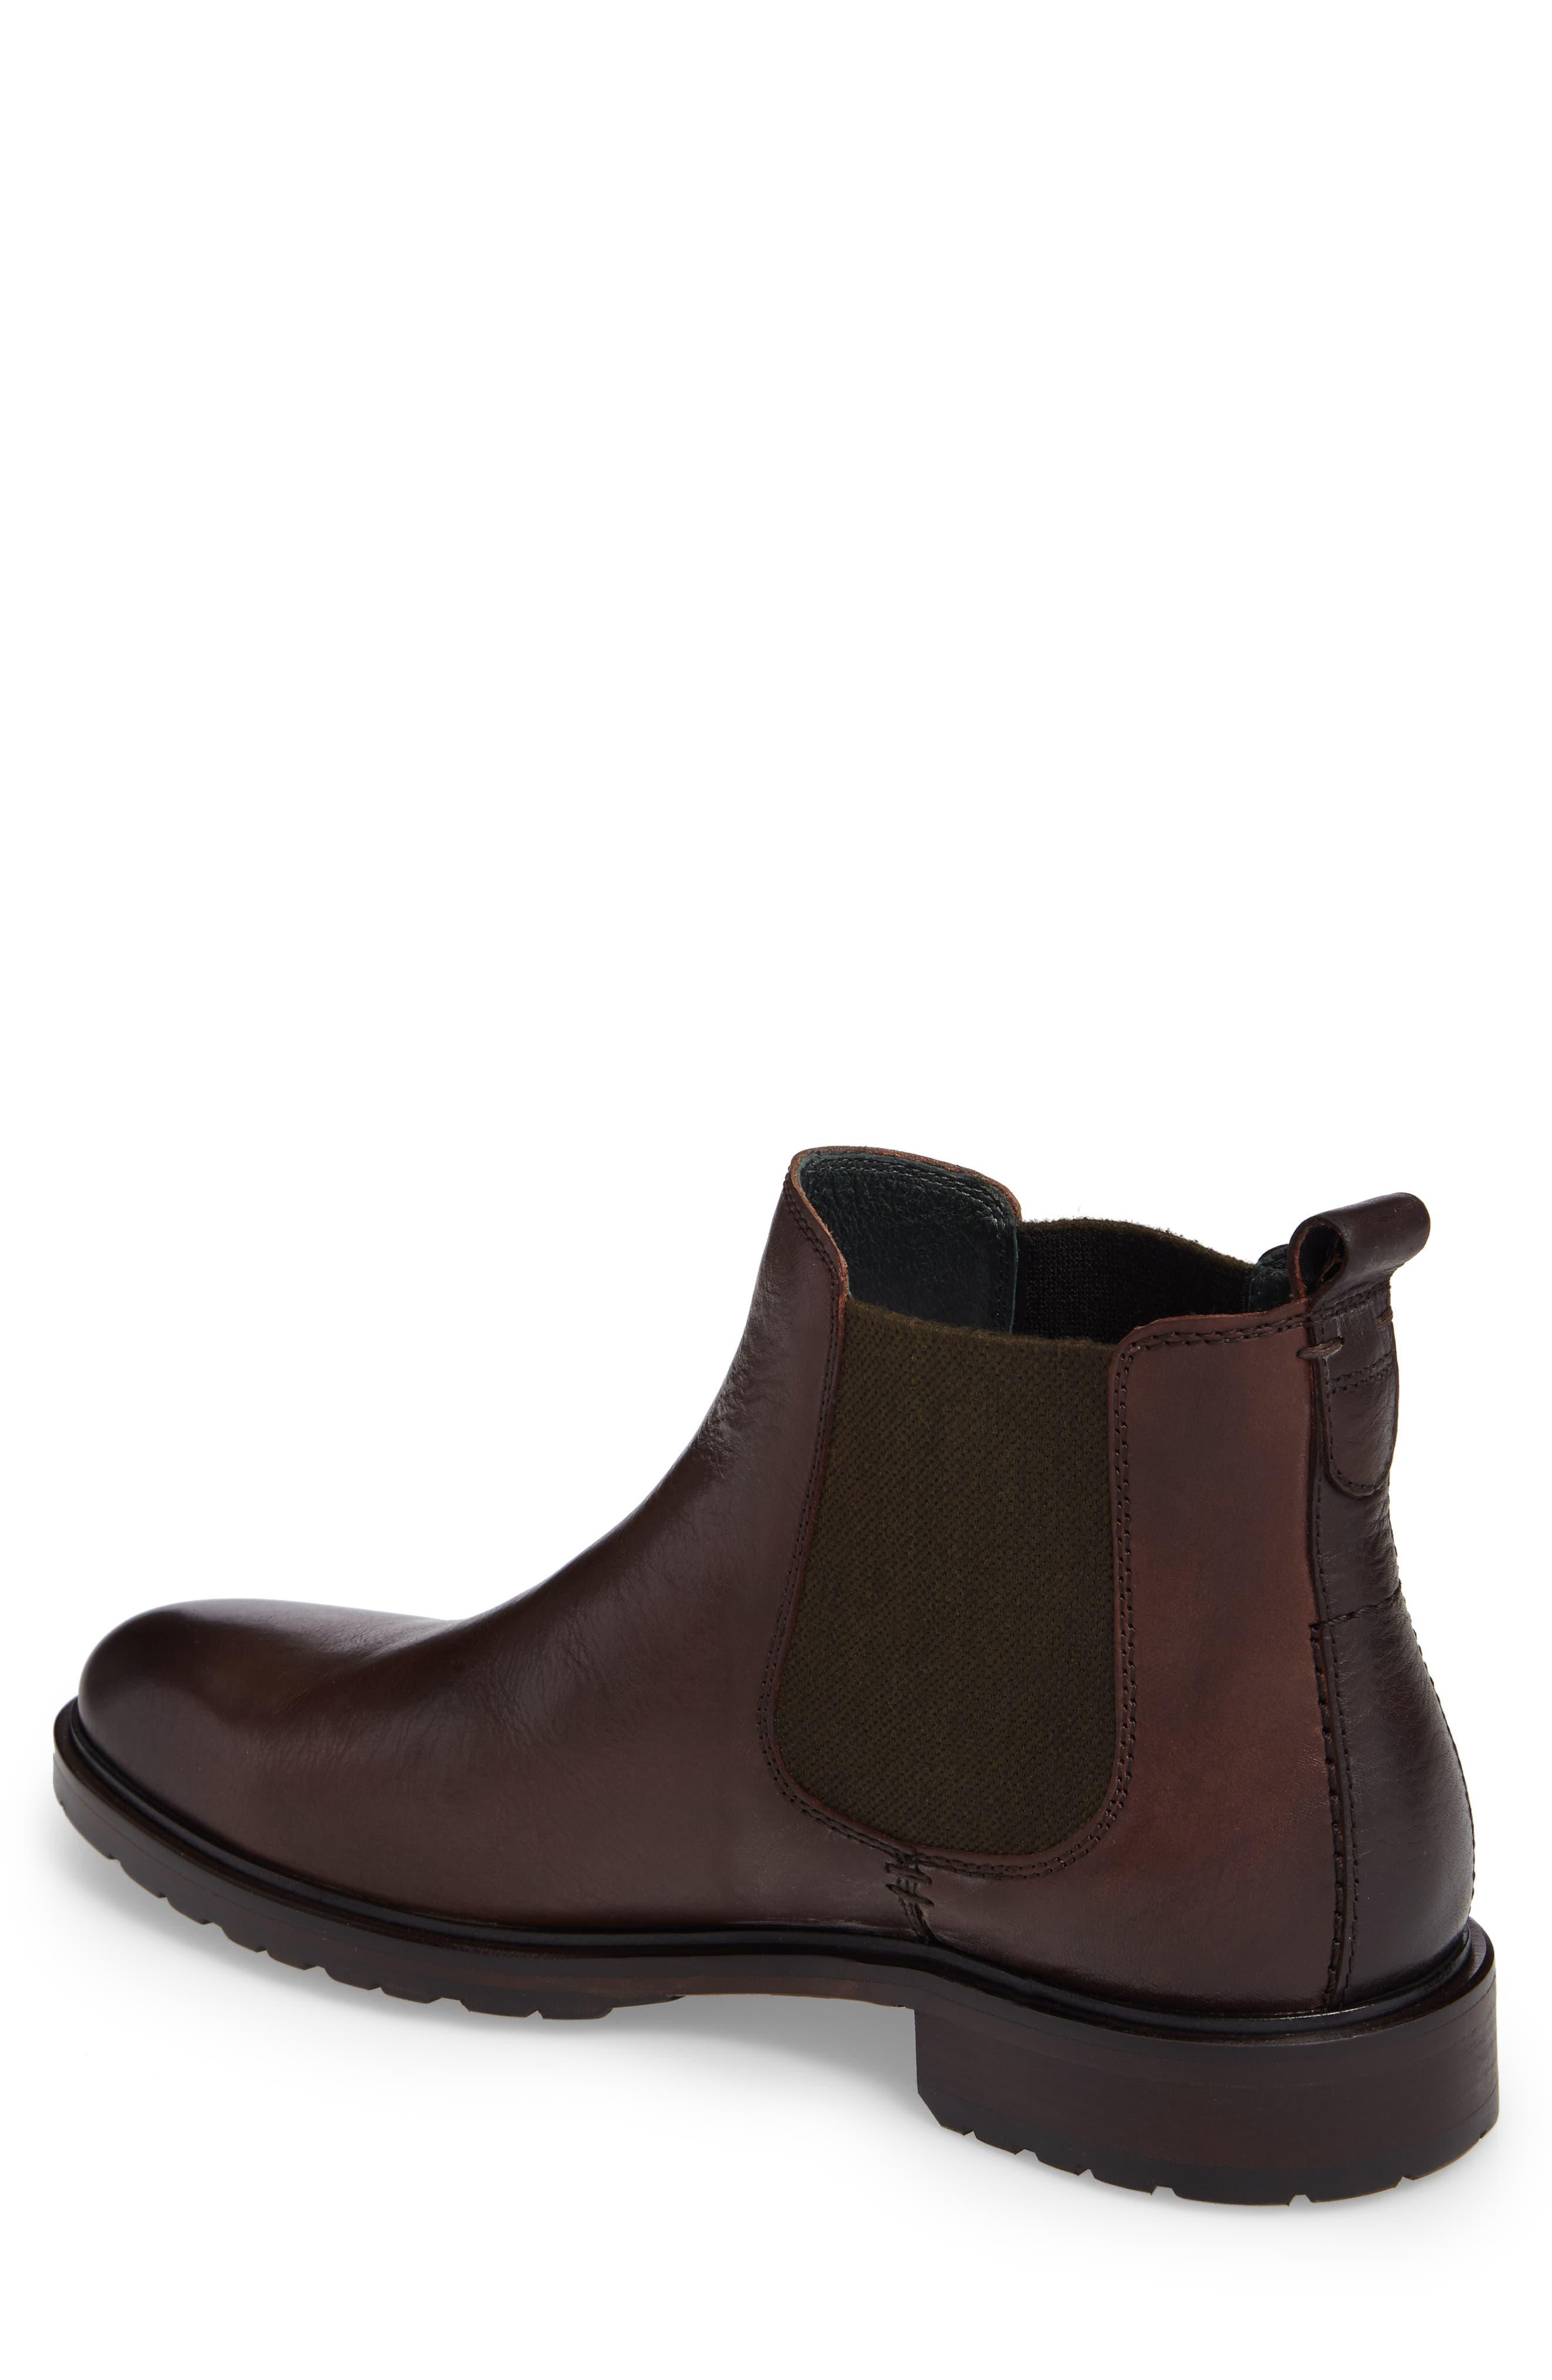 Myles Chelsea Boot,                             Alternate thumbnail 2, color,                             Mahogany Leather